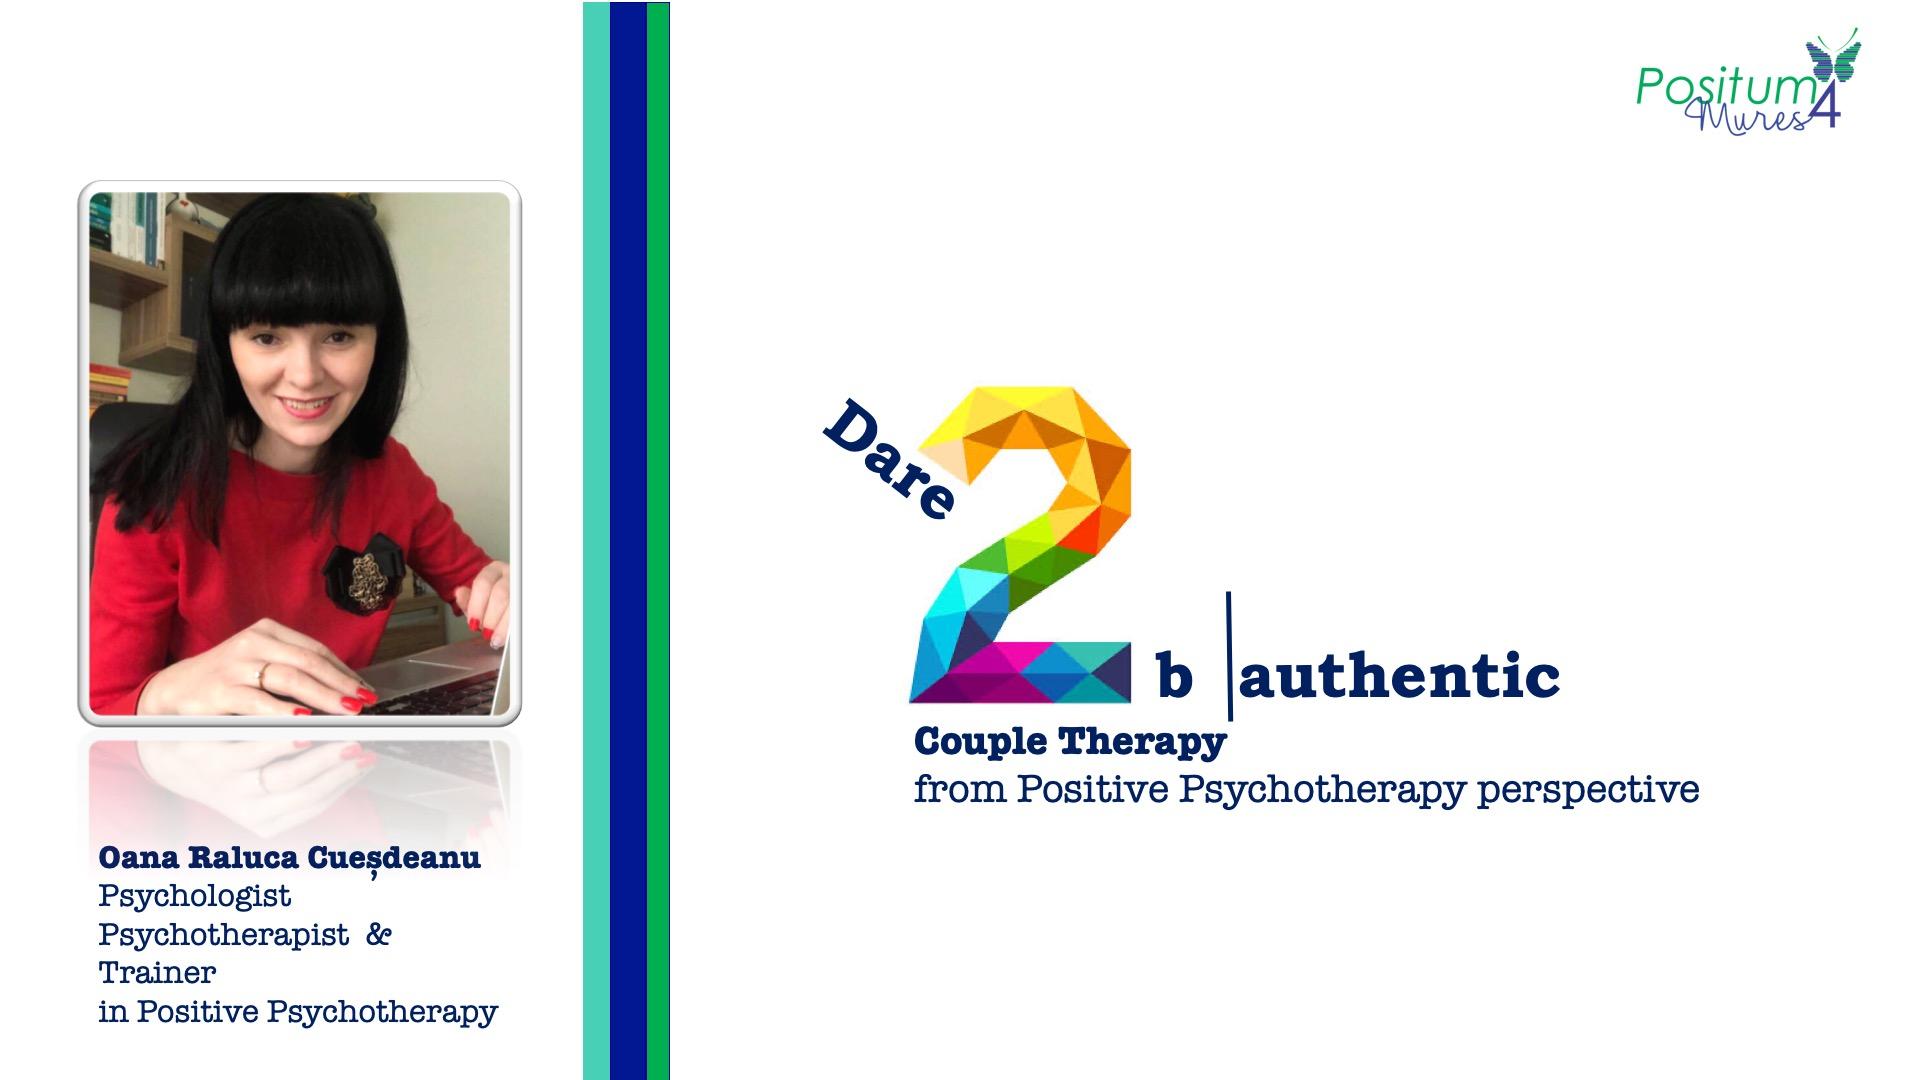 Workshop-terapia-de cuplu-Oana-Cuesdeanu